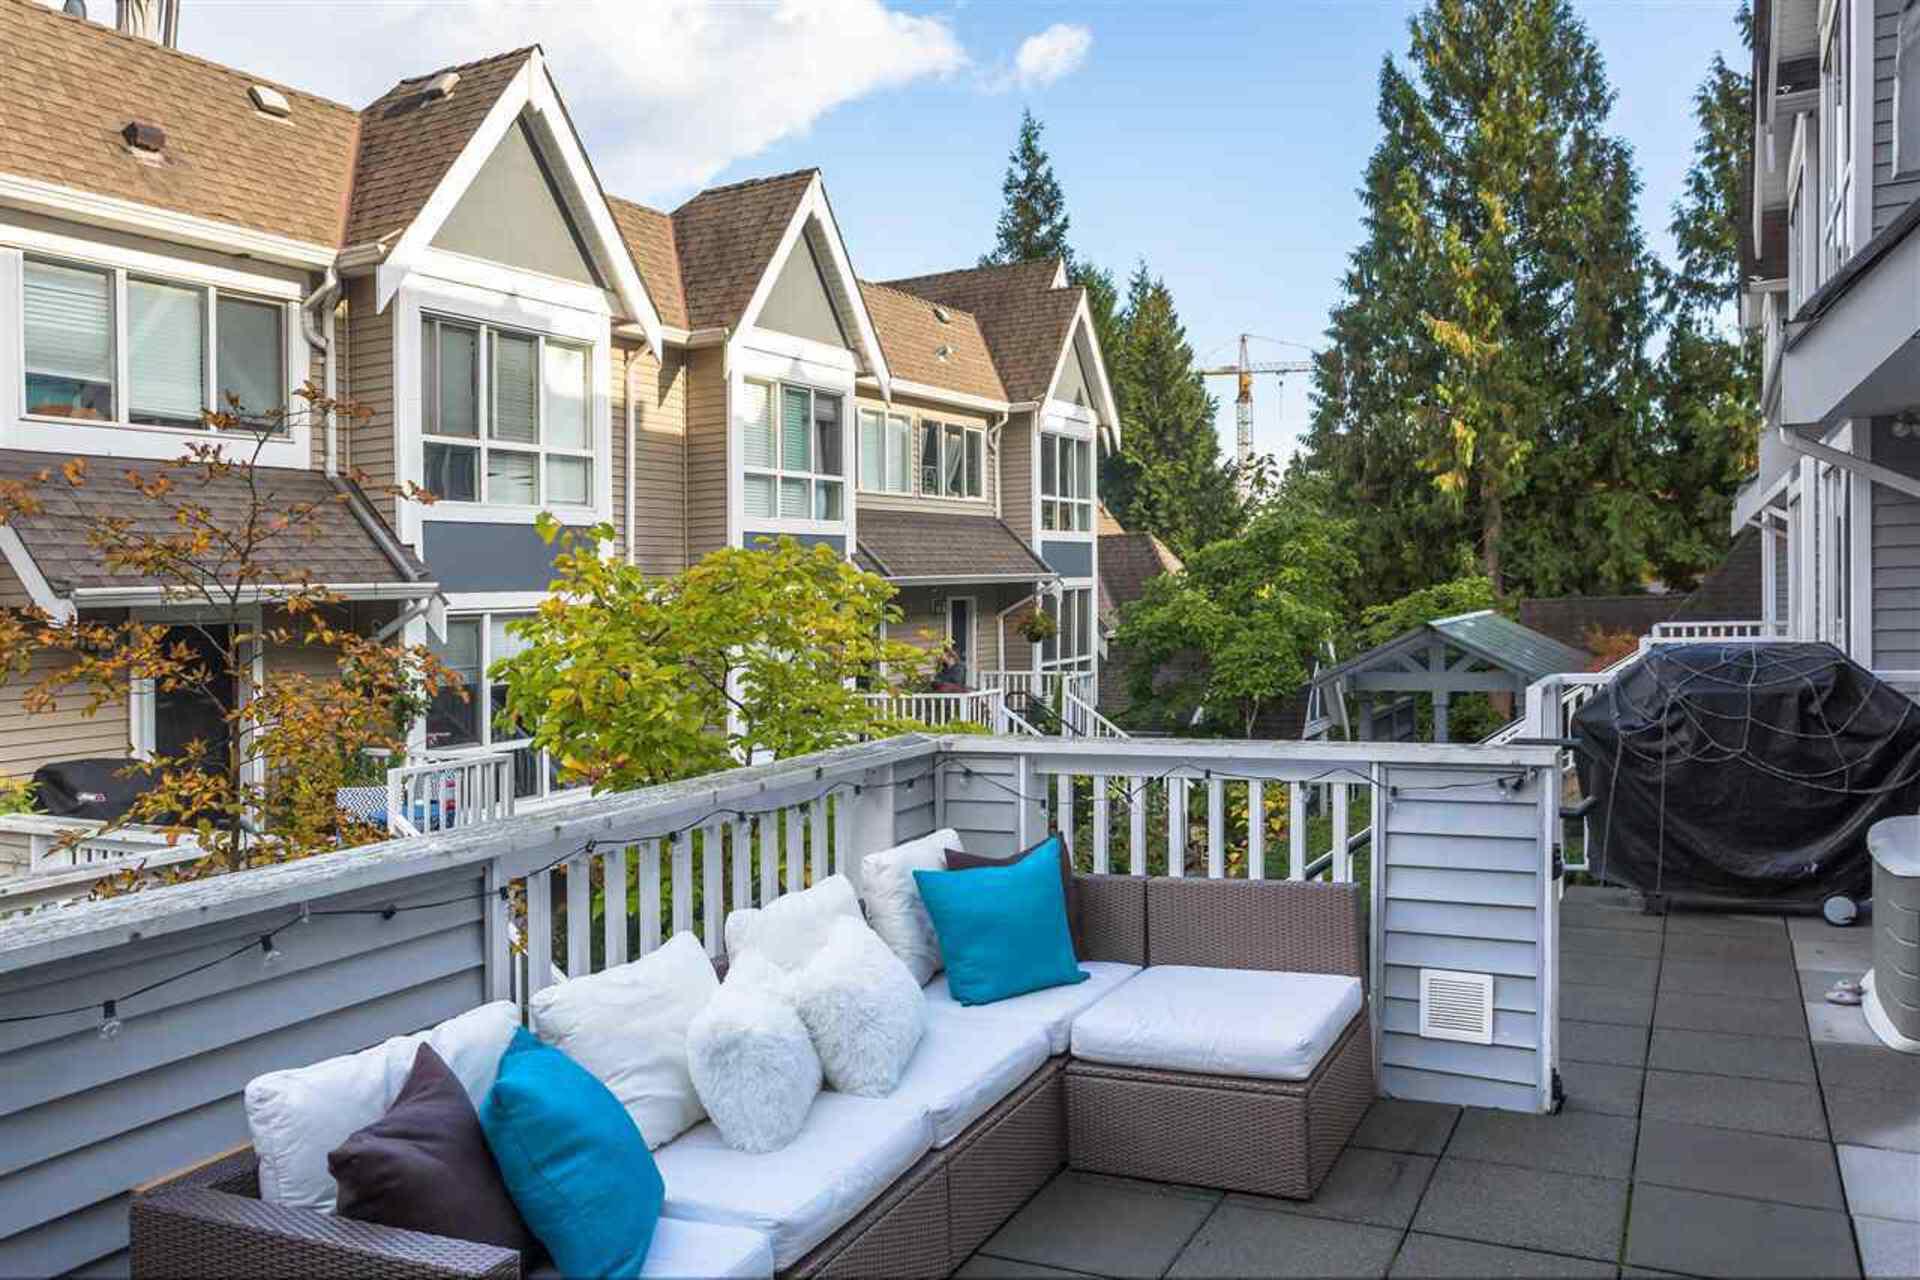 1015-lynn-valley-road-lynn-valley-north-vancouver-15 at 1 - 1015 Lynn Valley Road, Lynn Valley, North Vancouver